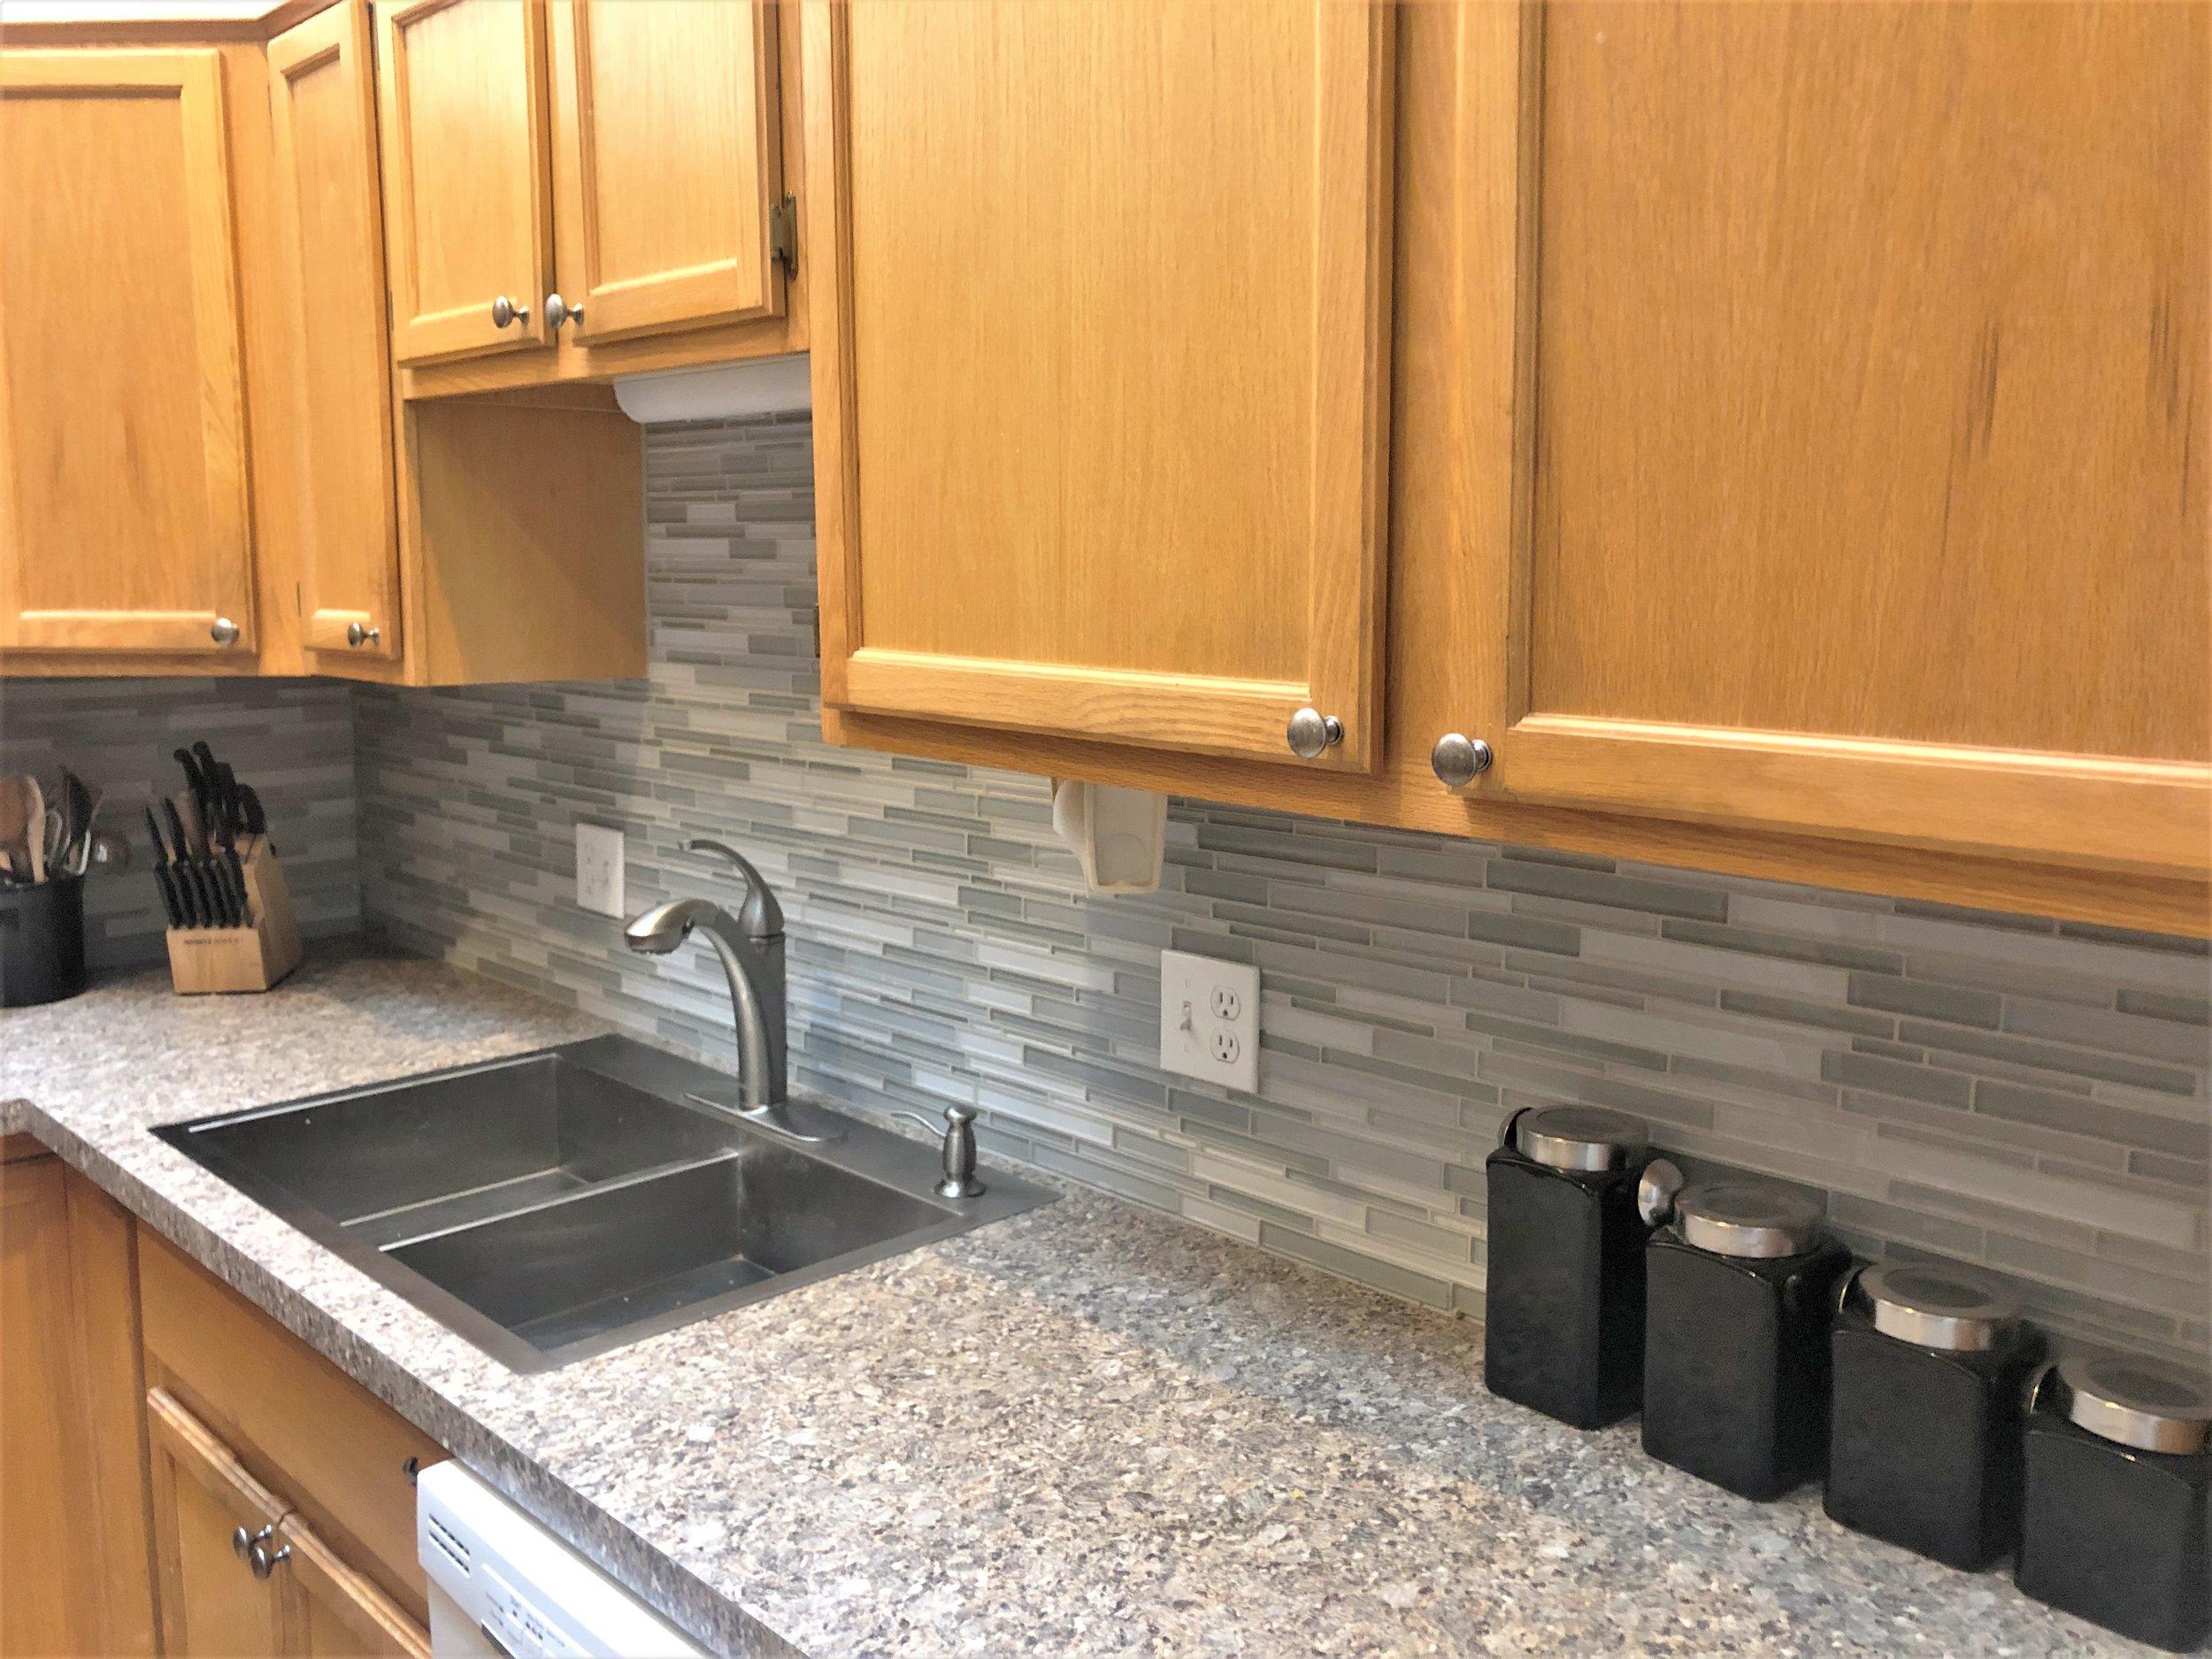 kitchen sink plumbing and drains.jpg